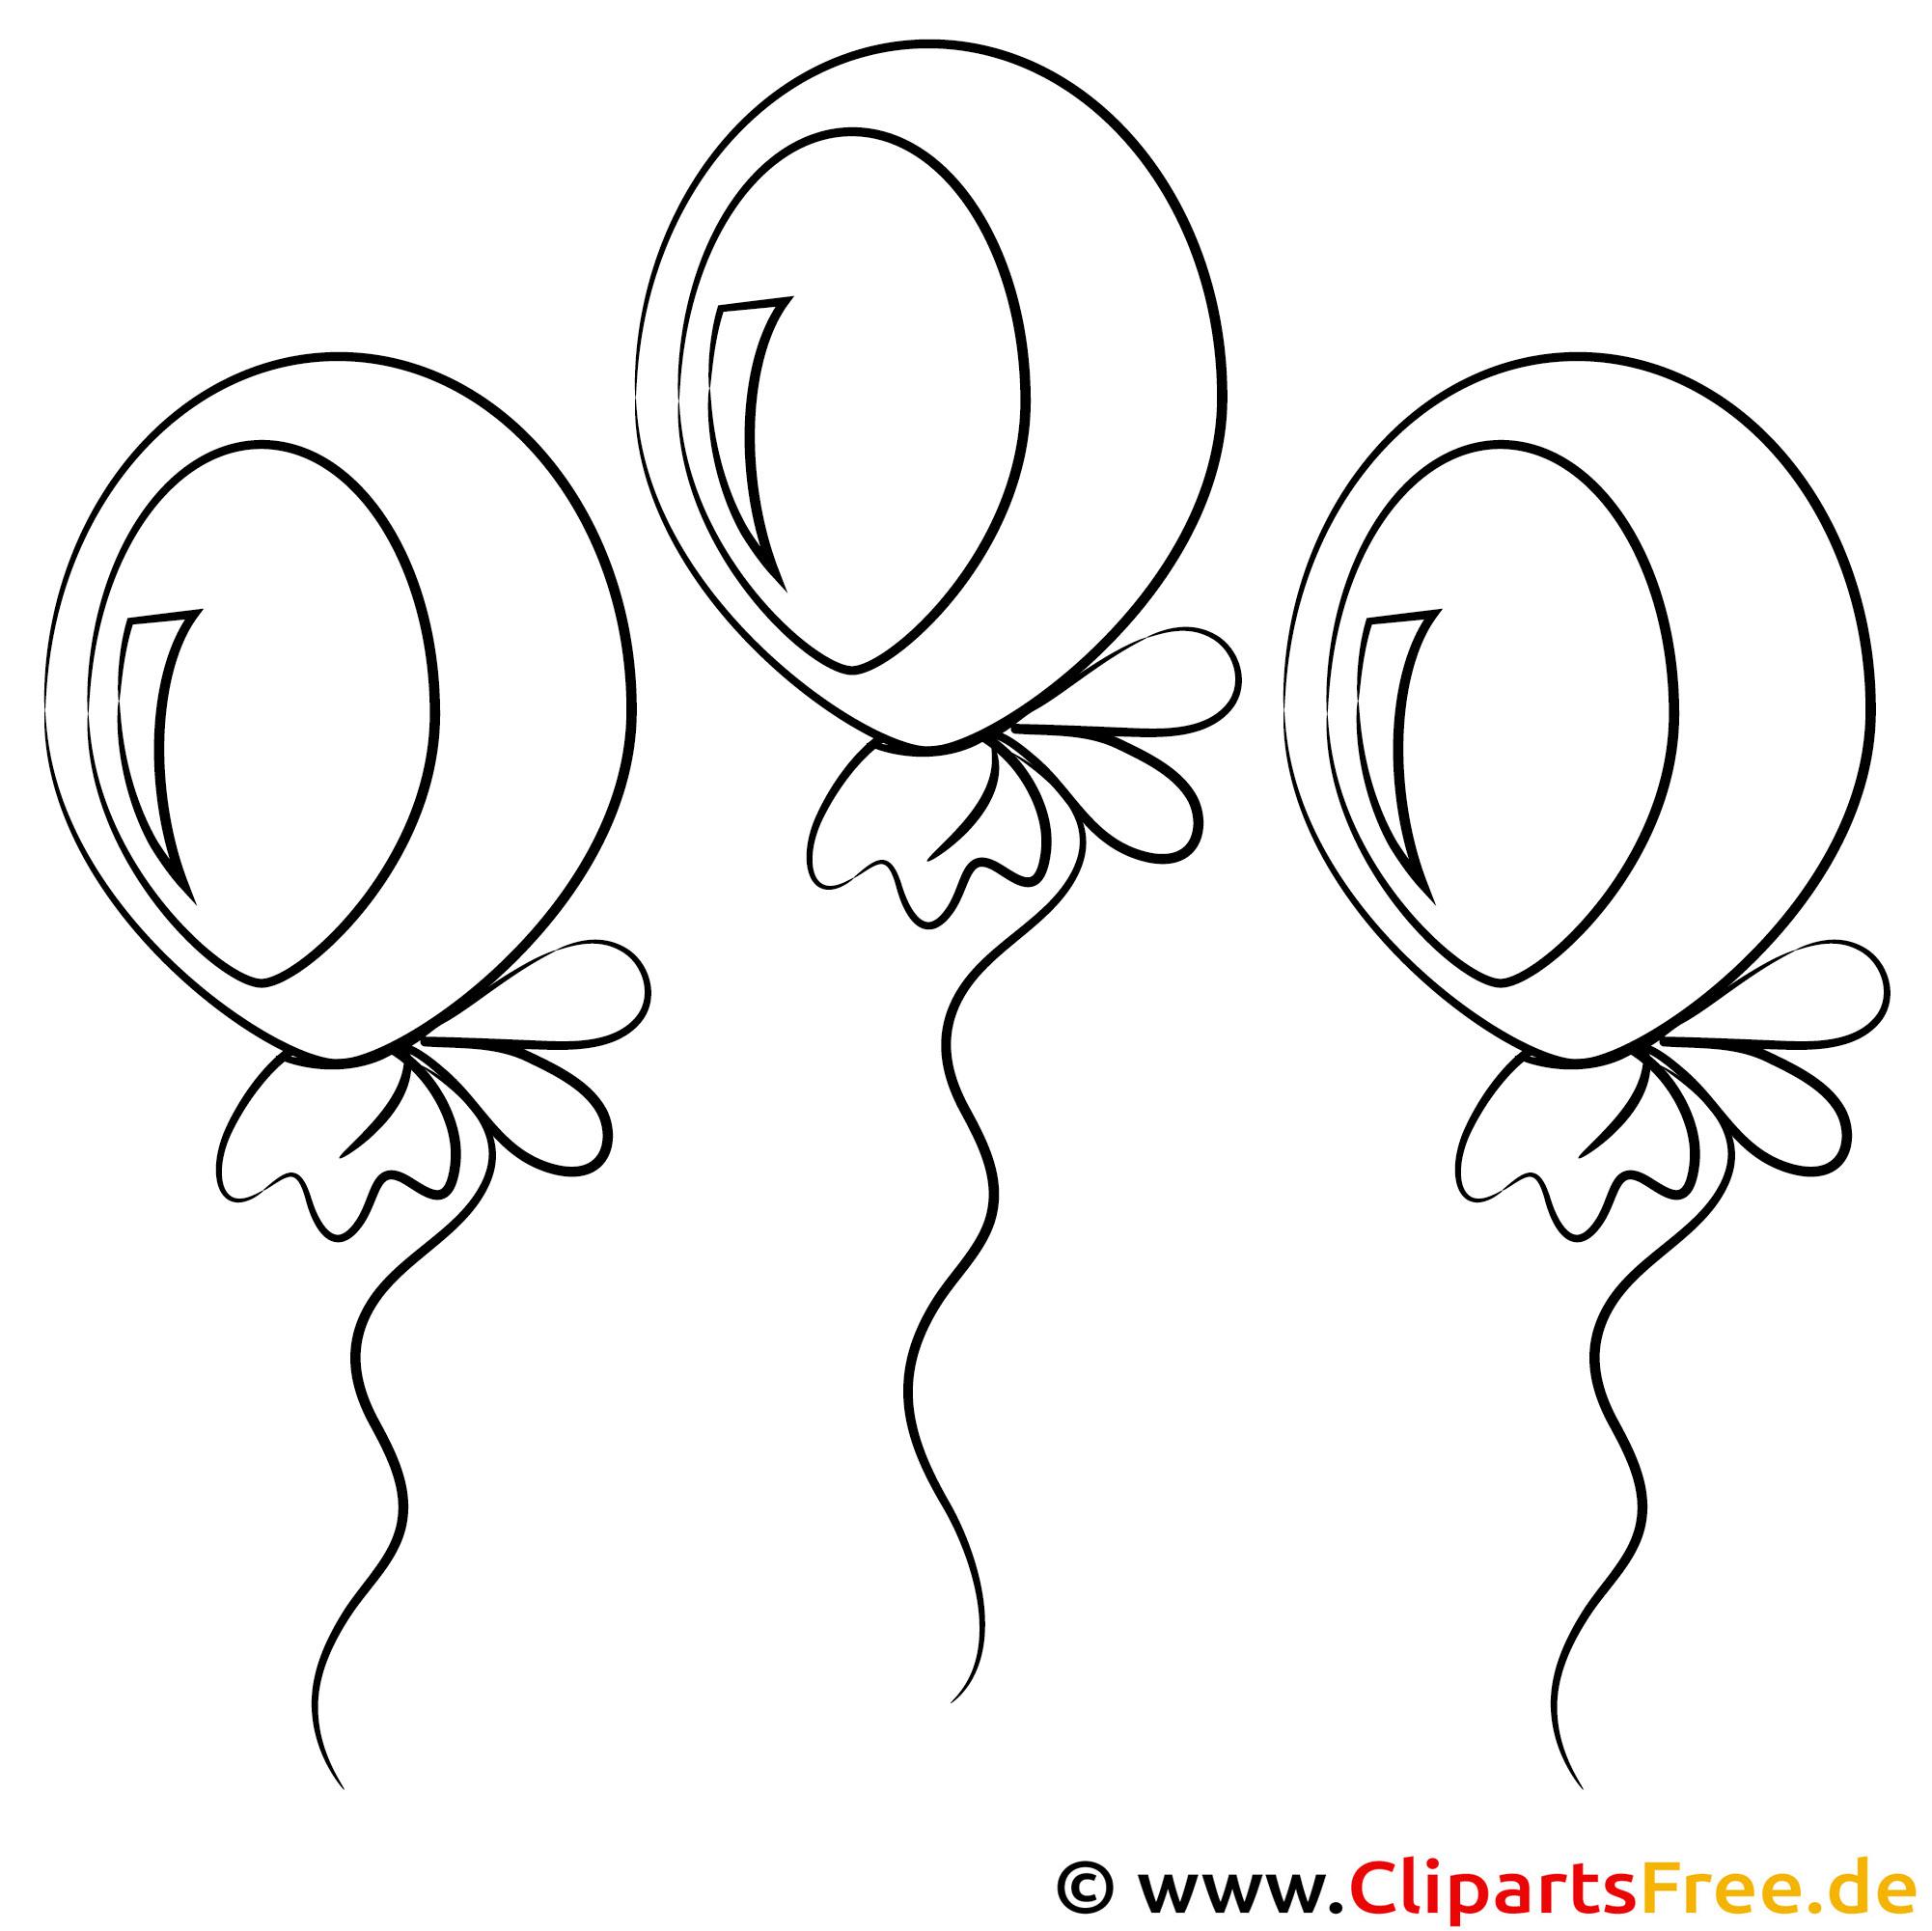 Bild zum Malen Luftballons